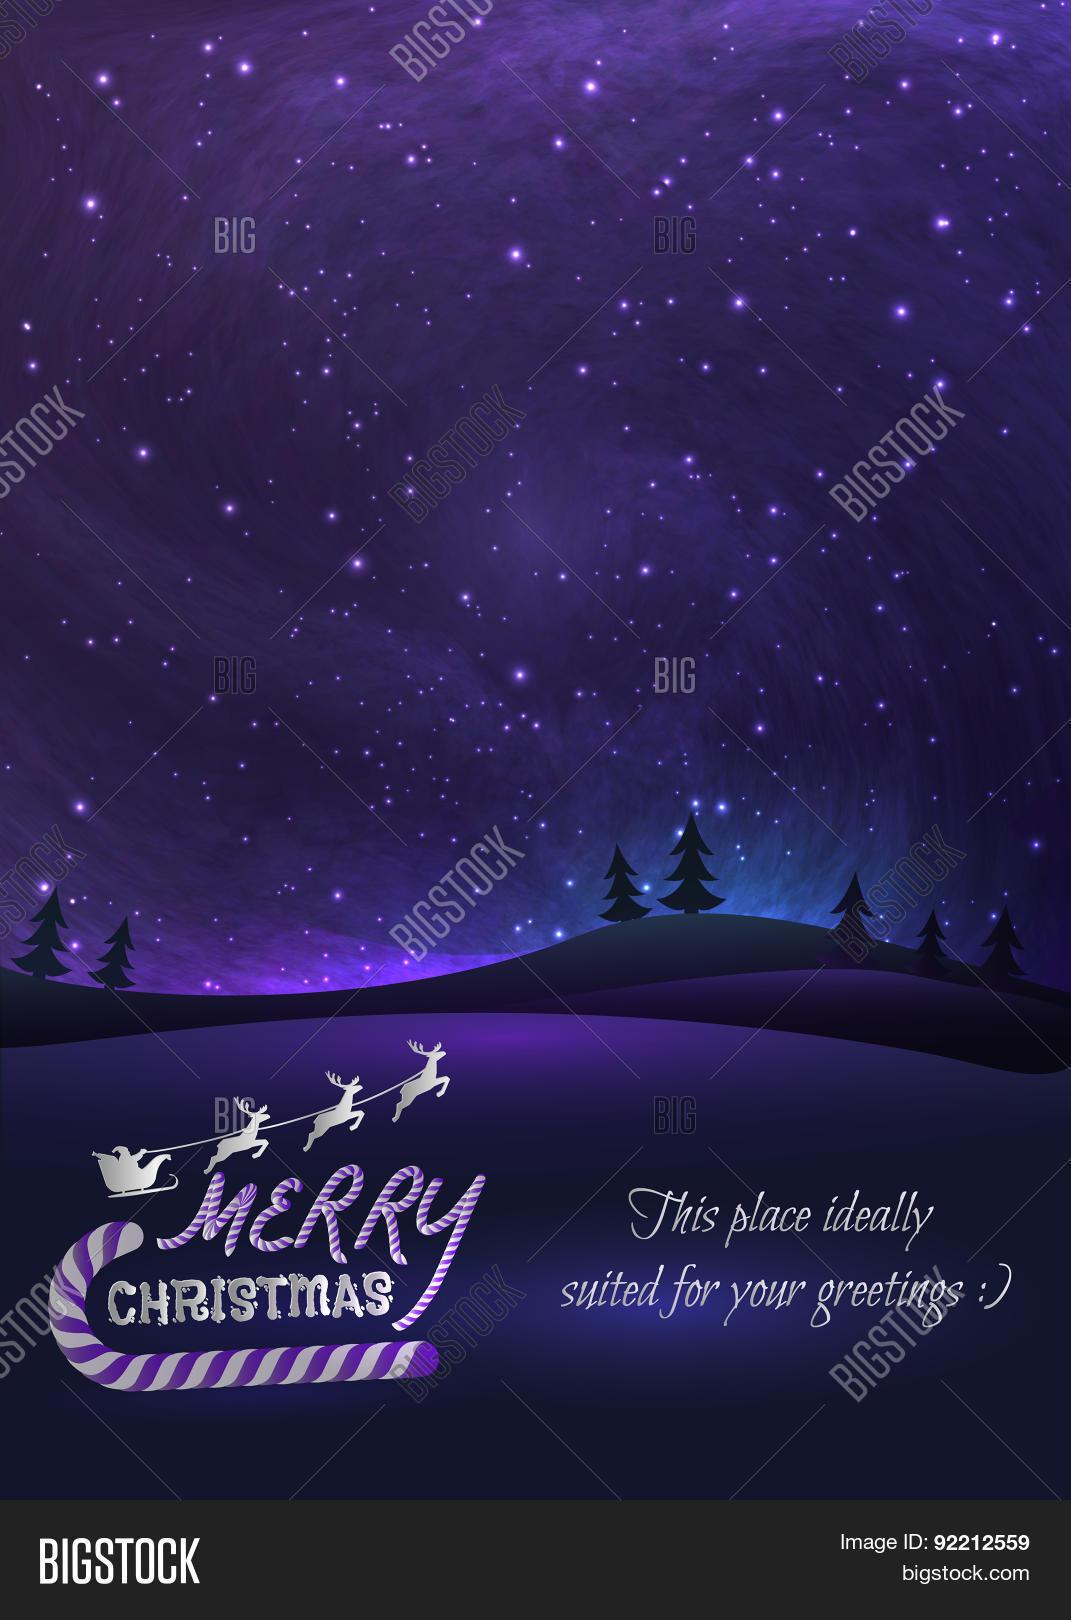 Merry Christmas Vector Photo Free Trial Bigstock